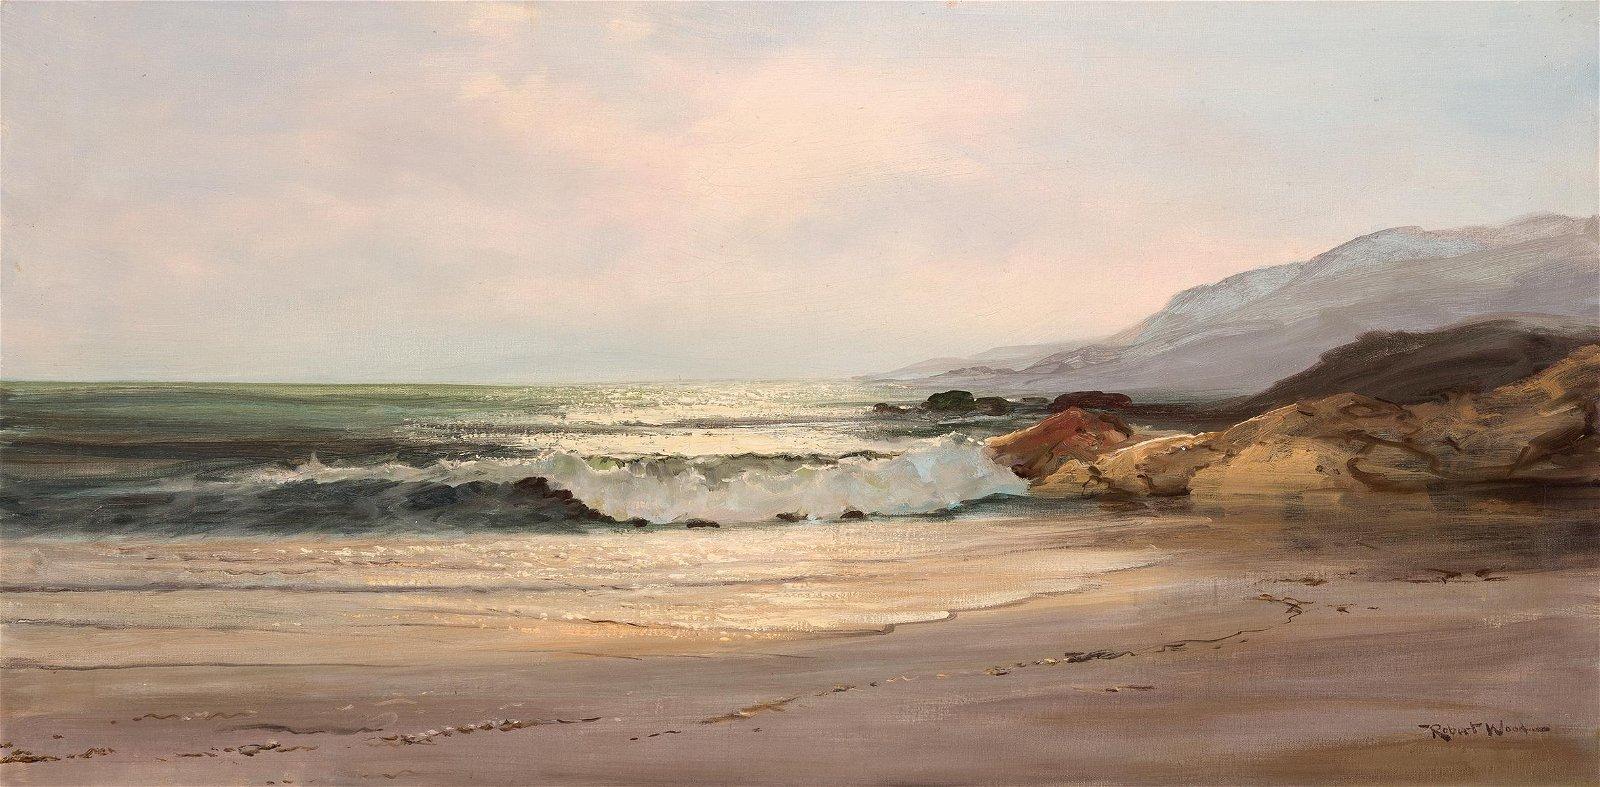 Robert Wood | Seascape